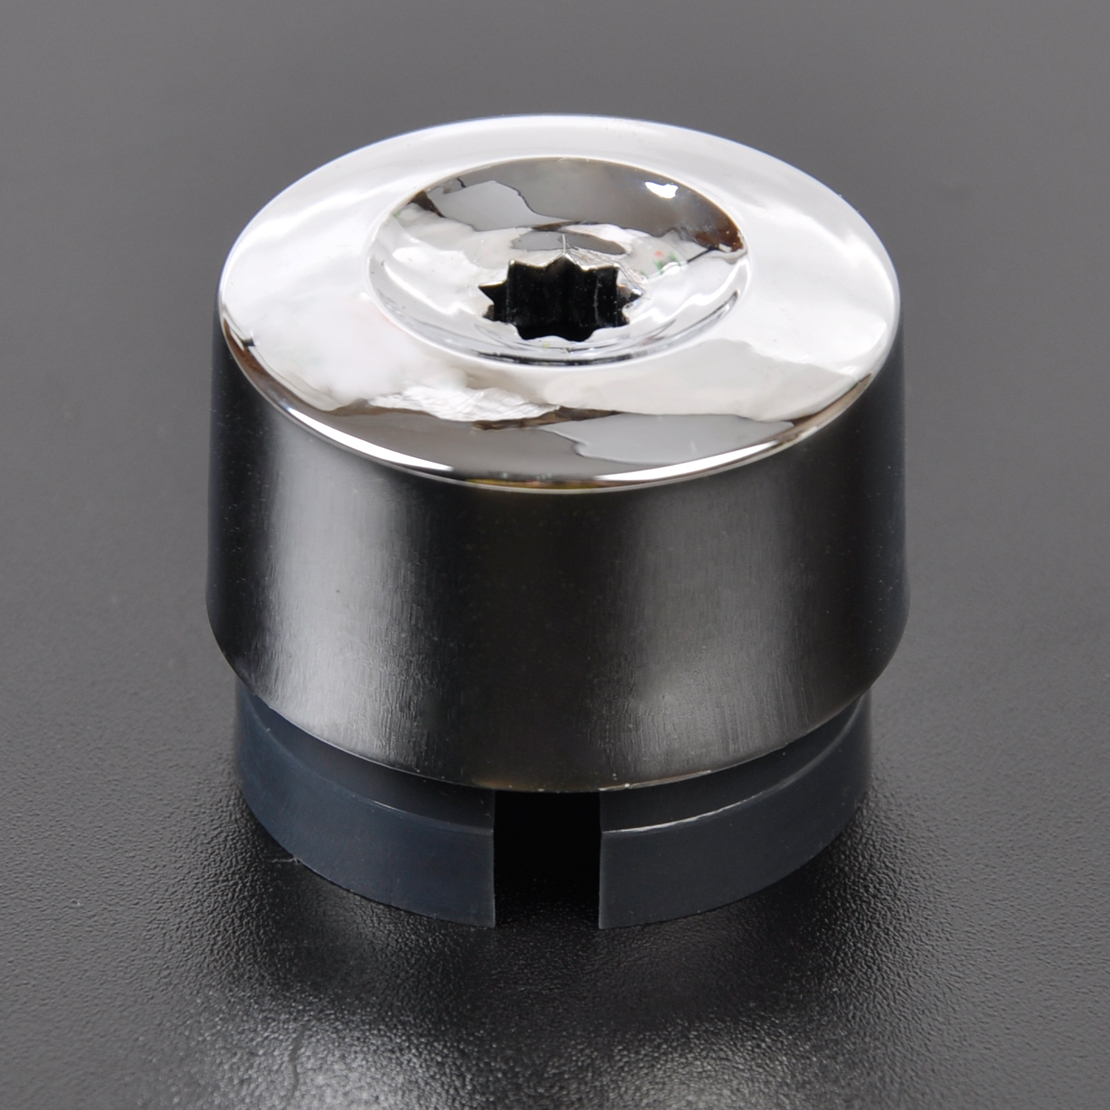 beler New Chrome Wheel Lug Bolt Nut Cap Cover 7L6601173A 7L6601173A2ZZ for VW Volkswagen Touareg 2004 2005 2006 2007 2008-2014 ...